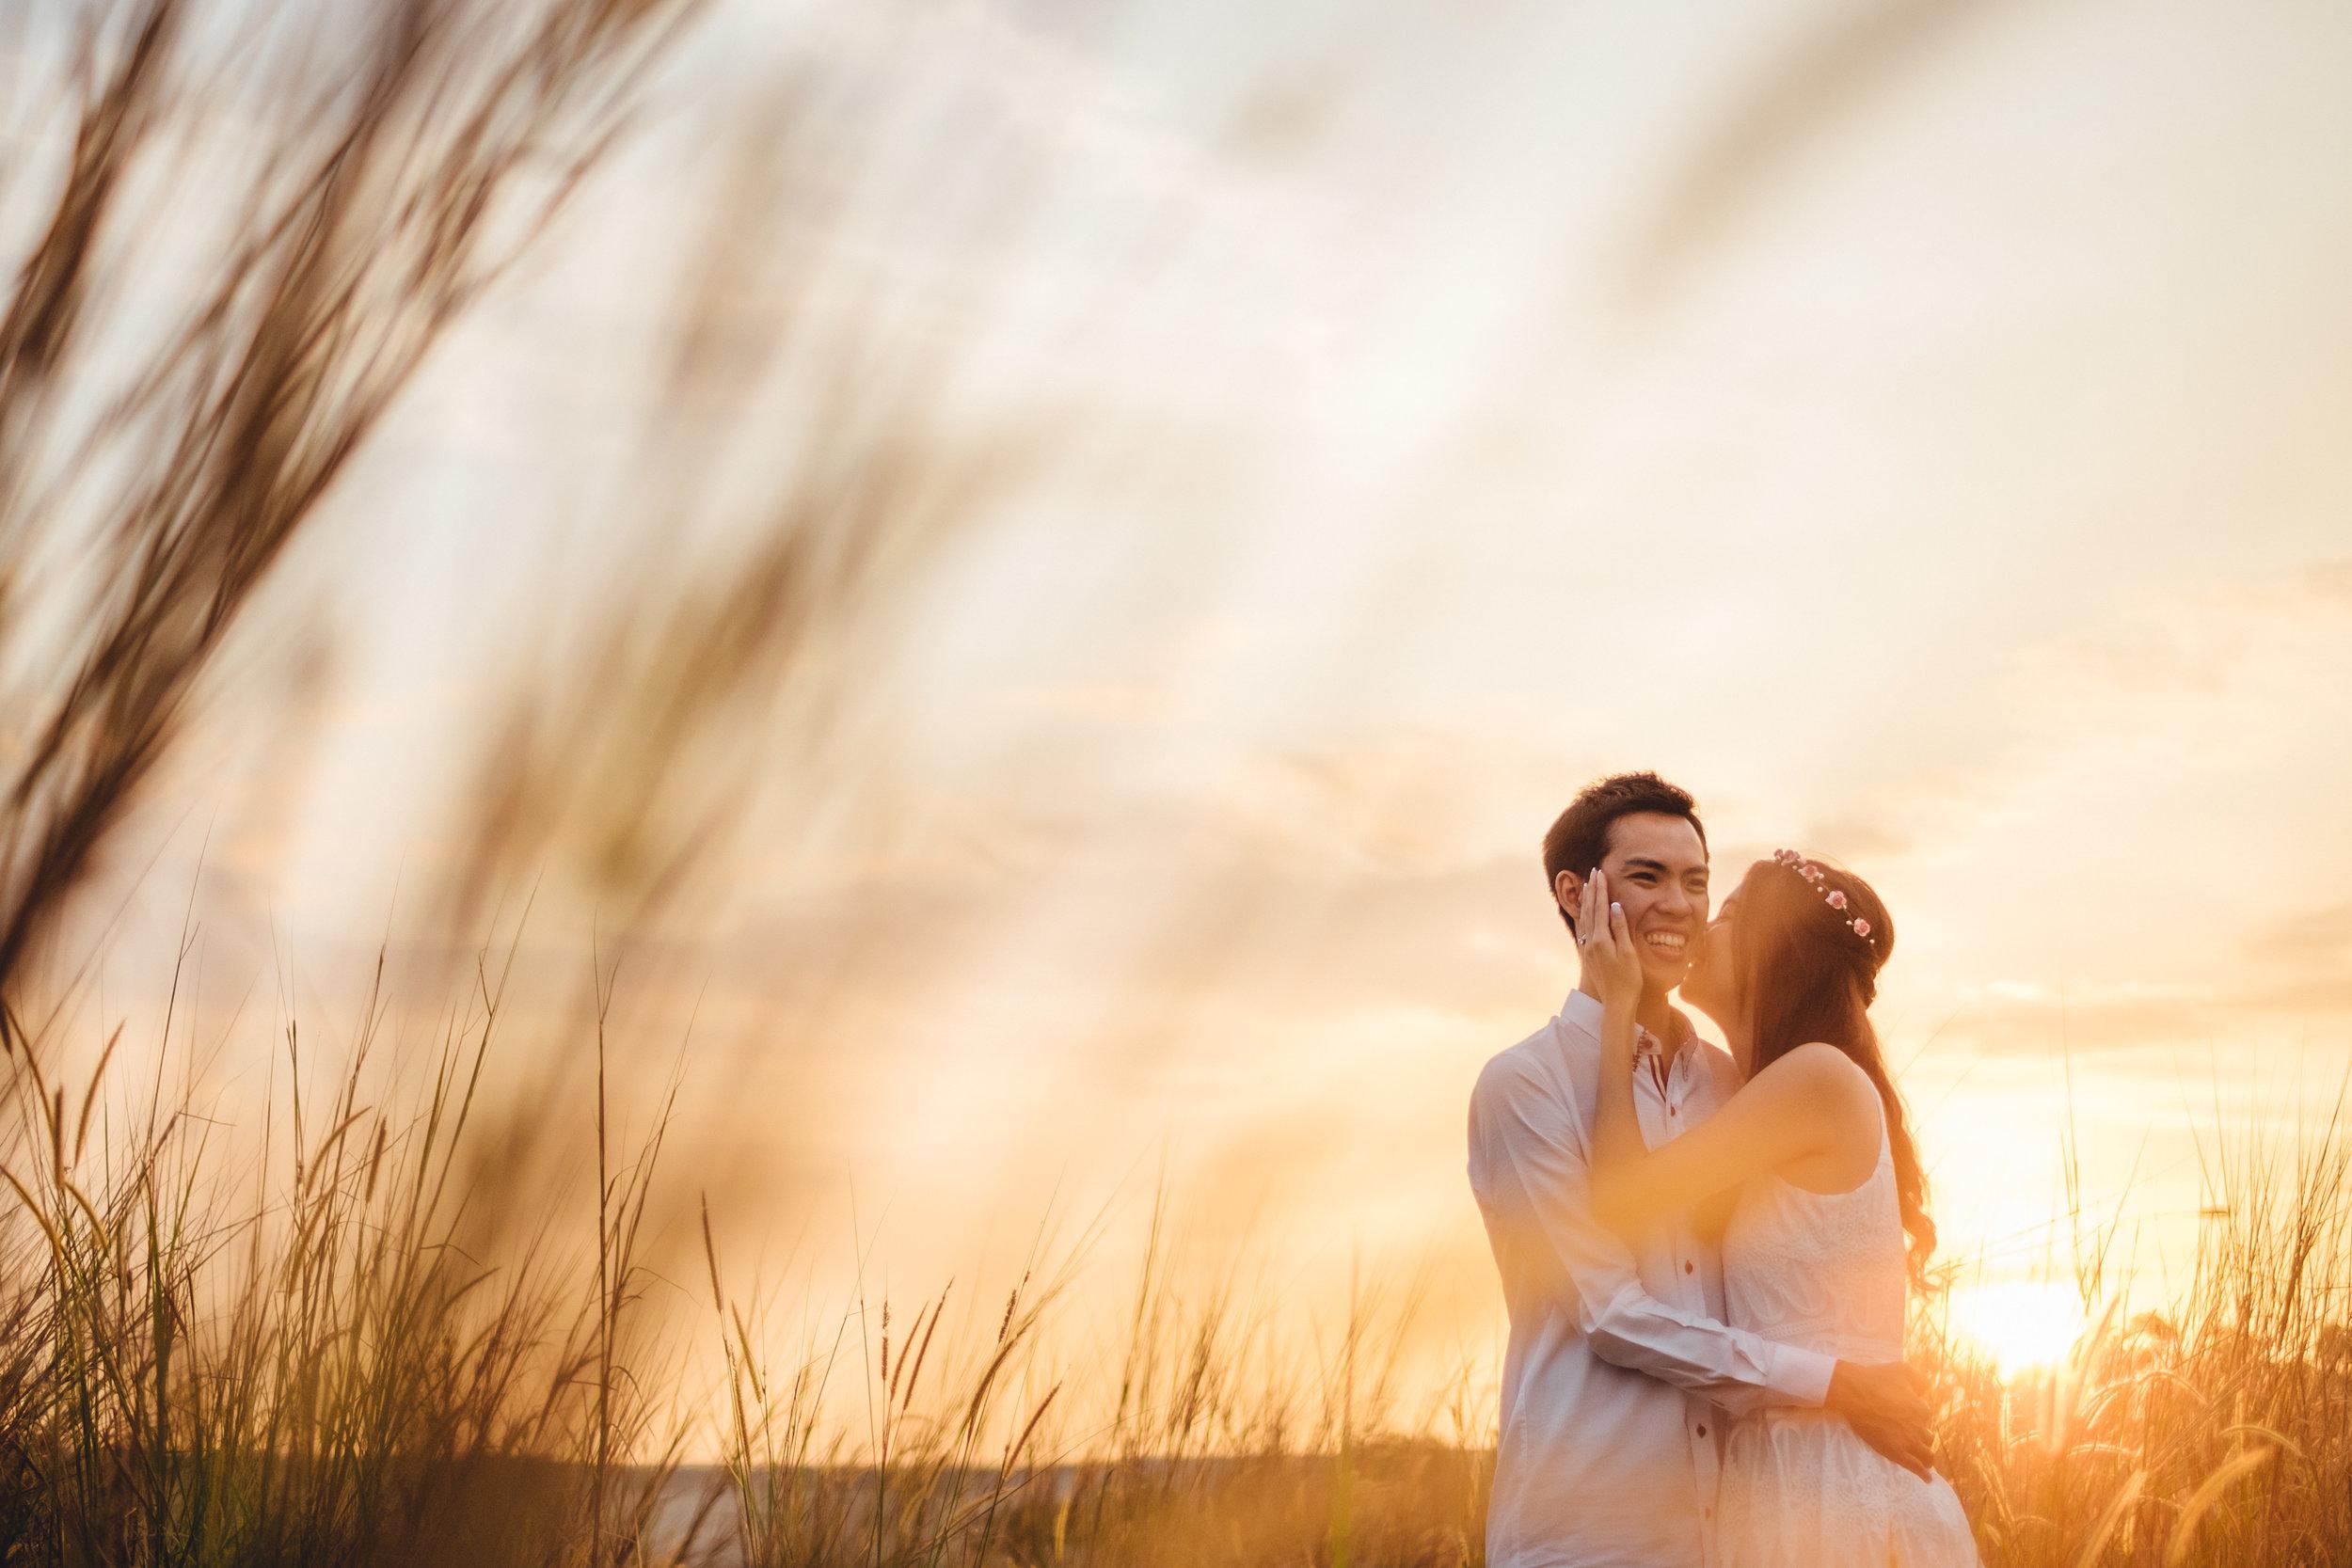 Juxtapose Pix - Pre-Wedding - Mark & Therese - Tuas Sunset 00010.jpg